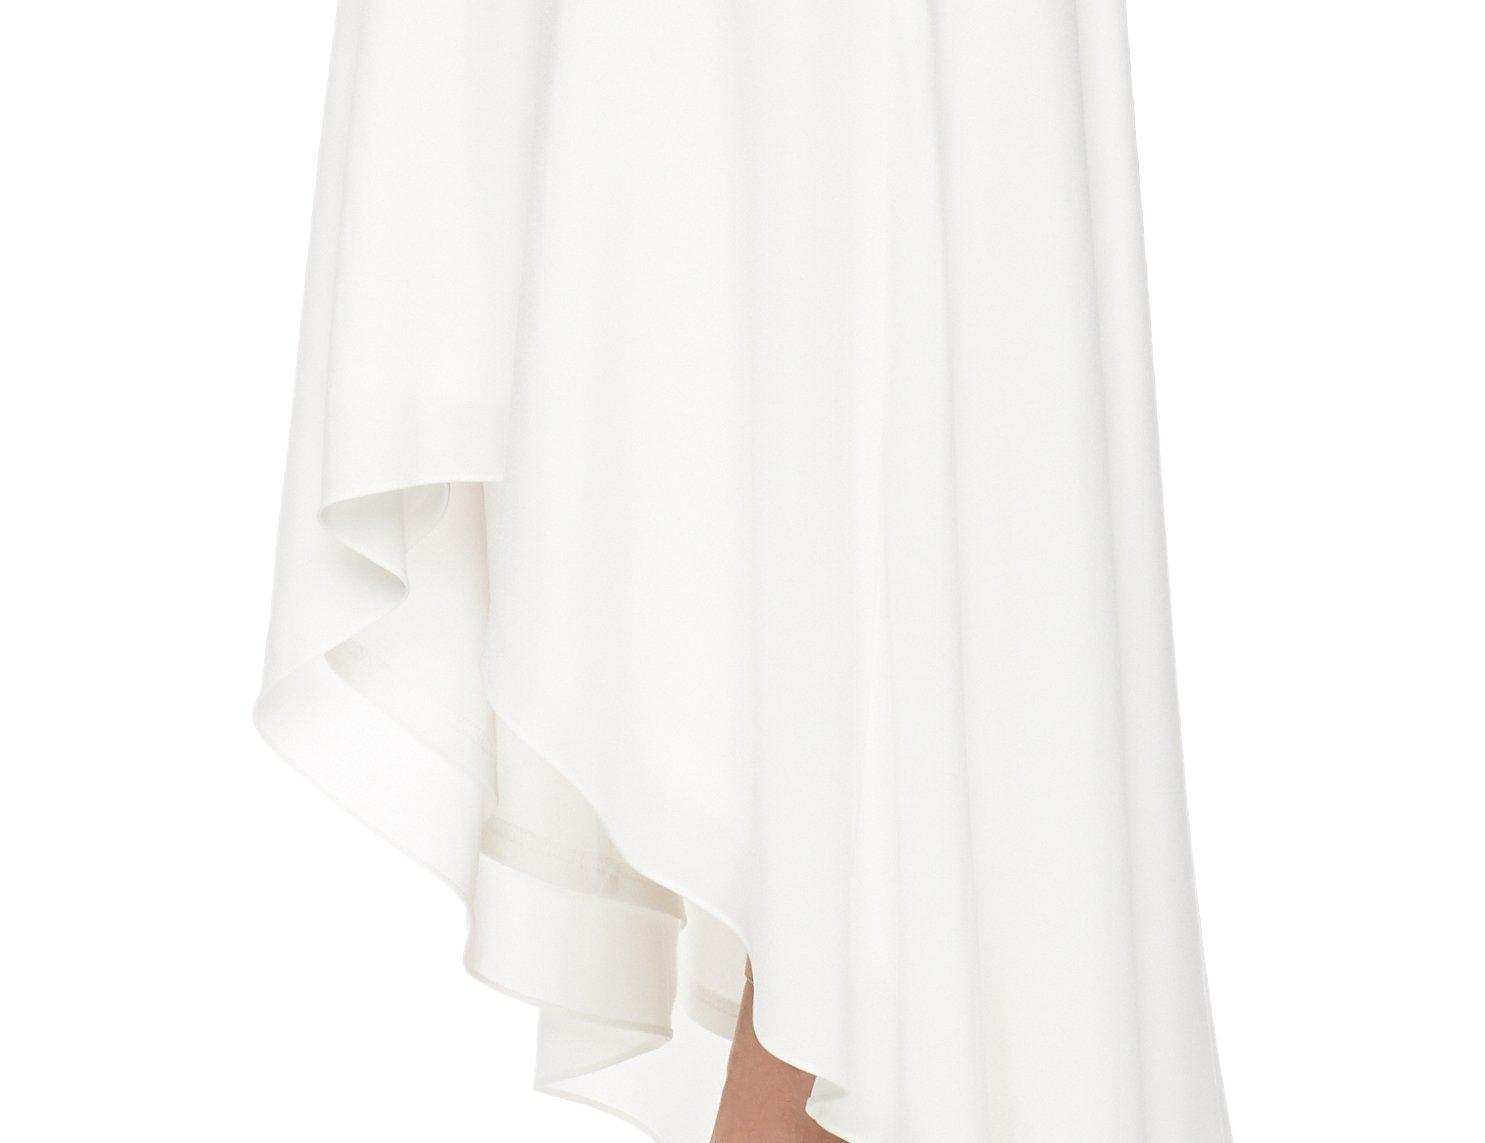 Social Graces Women's Sheer Long Sleeve Ruffle High/Low Skirt Stretch Crepe Maxi Dress 18 Plus Cream by Social Graces (Image #5)